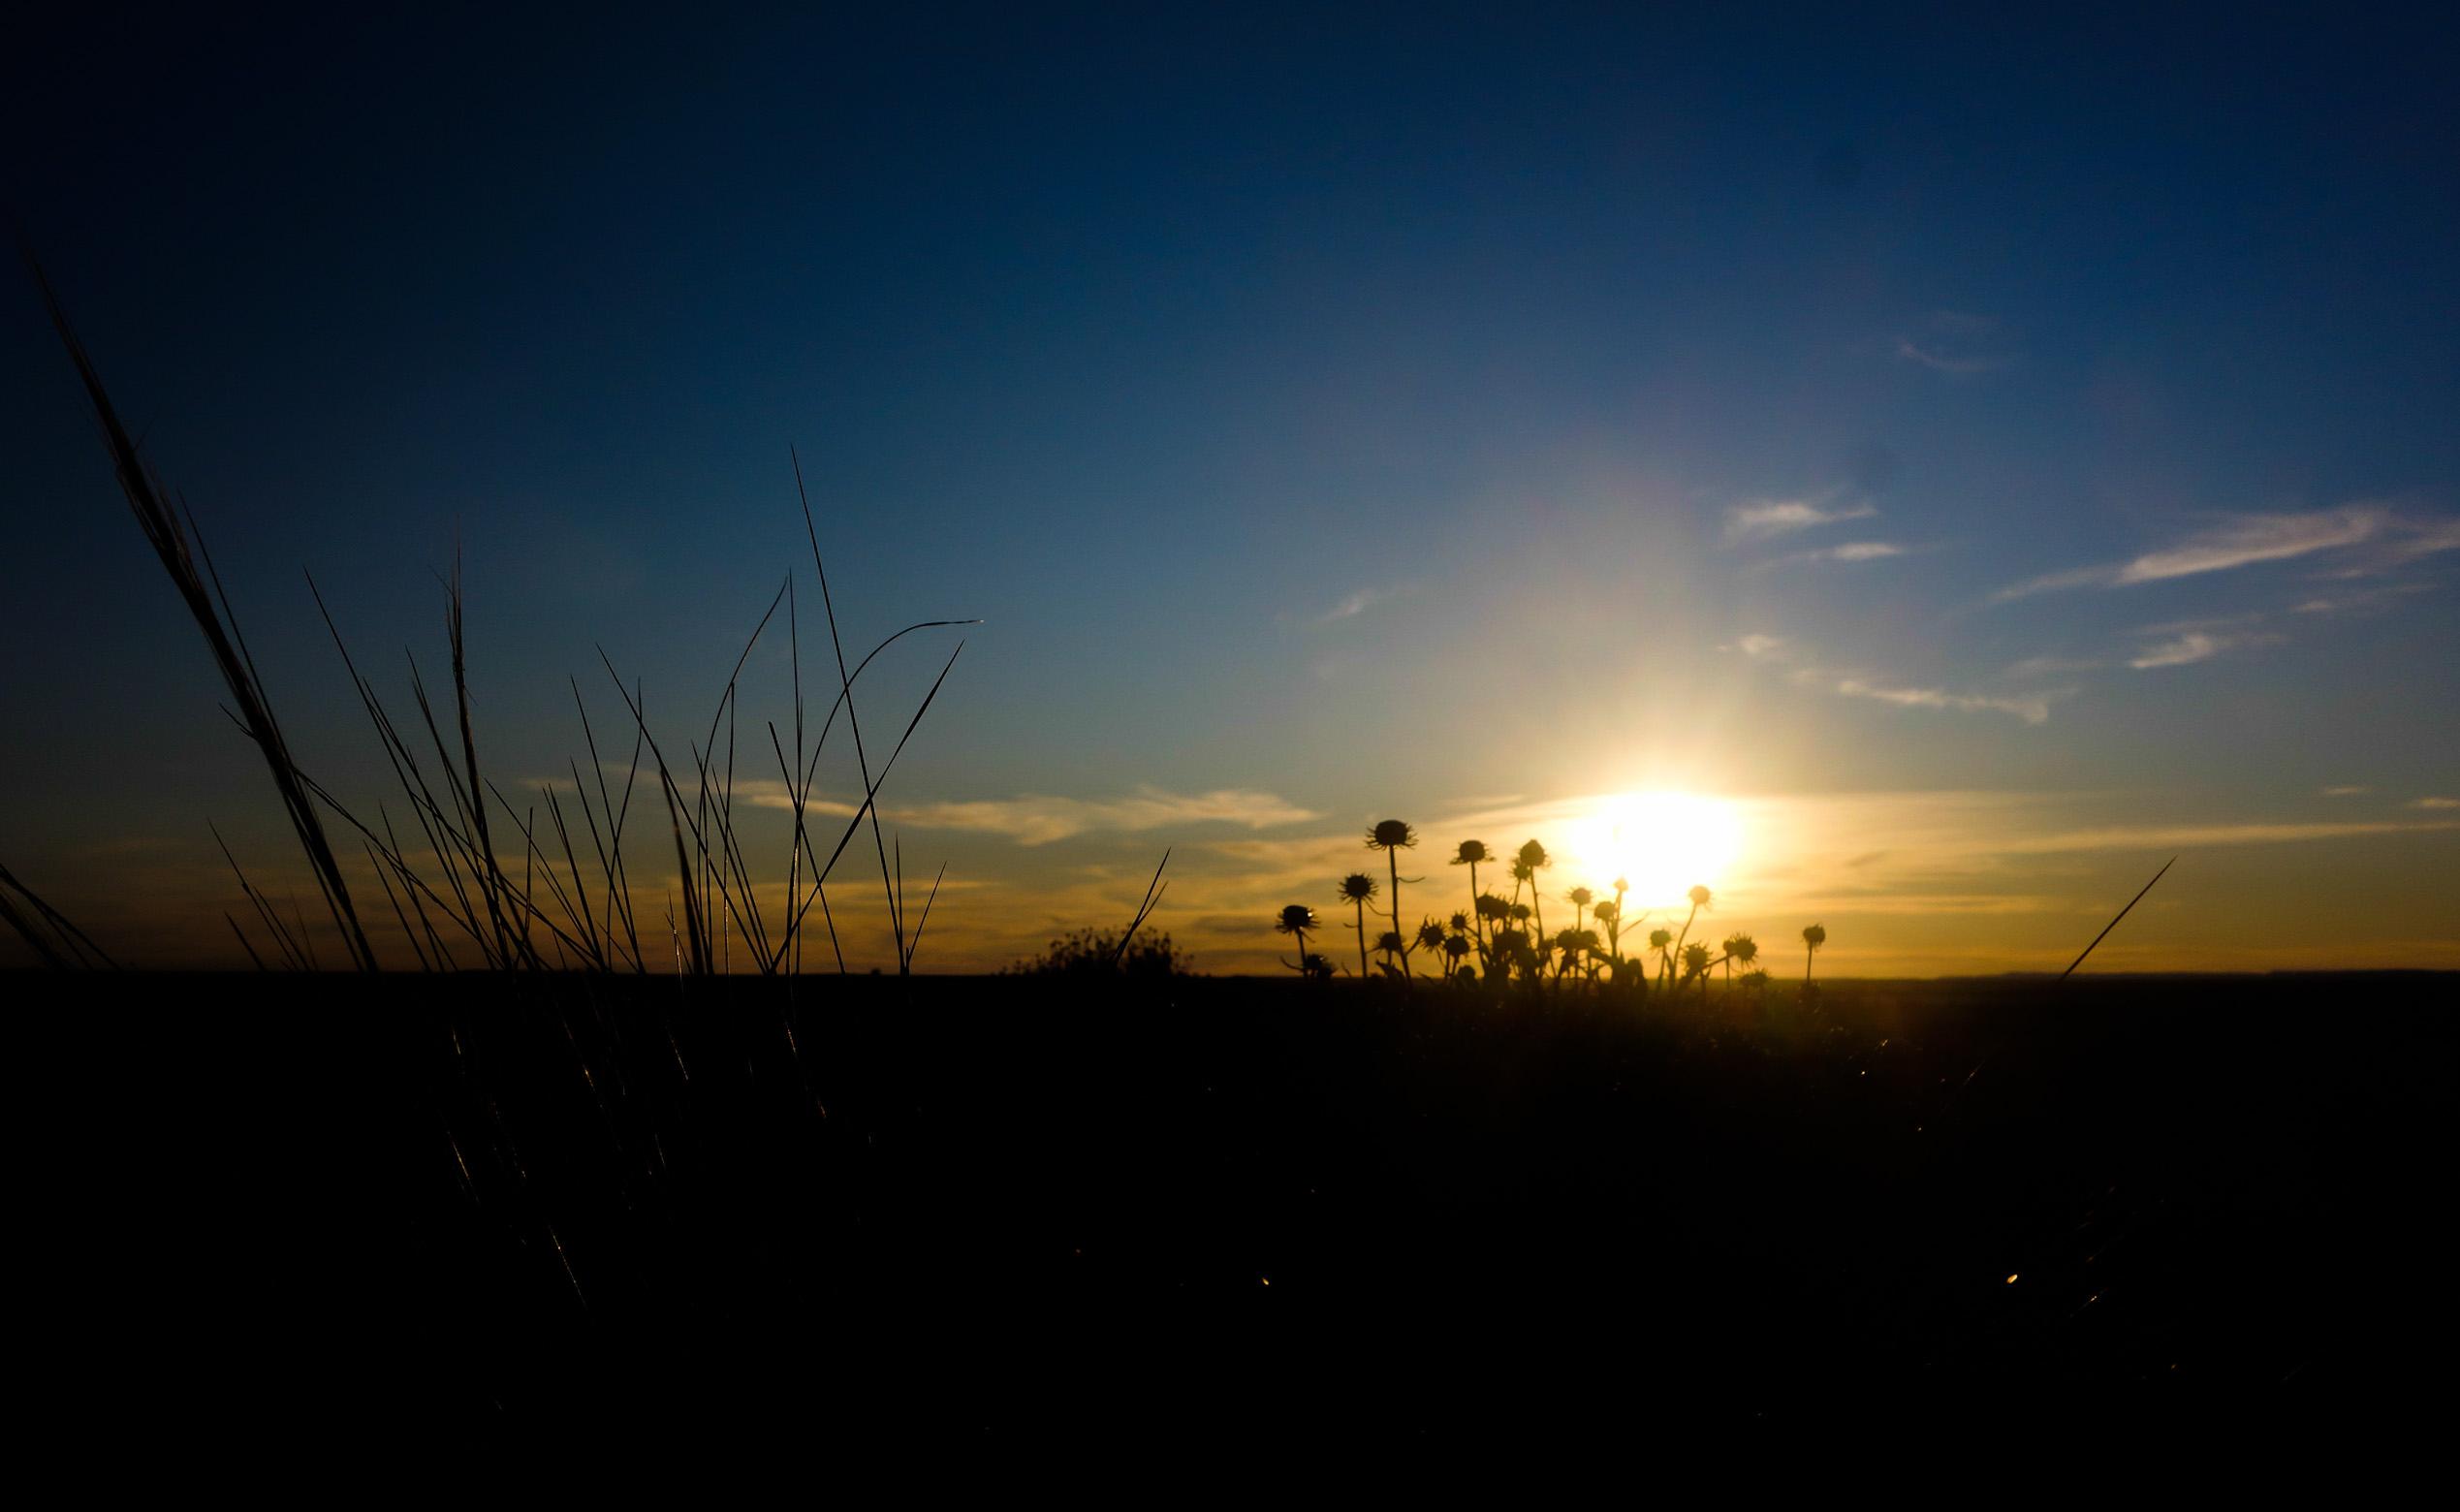 Coucher de soleil en Patagonie